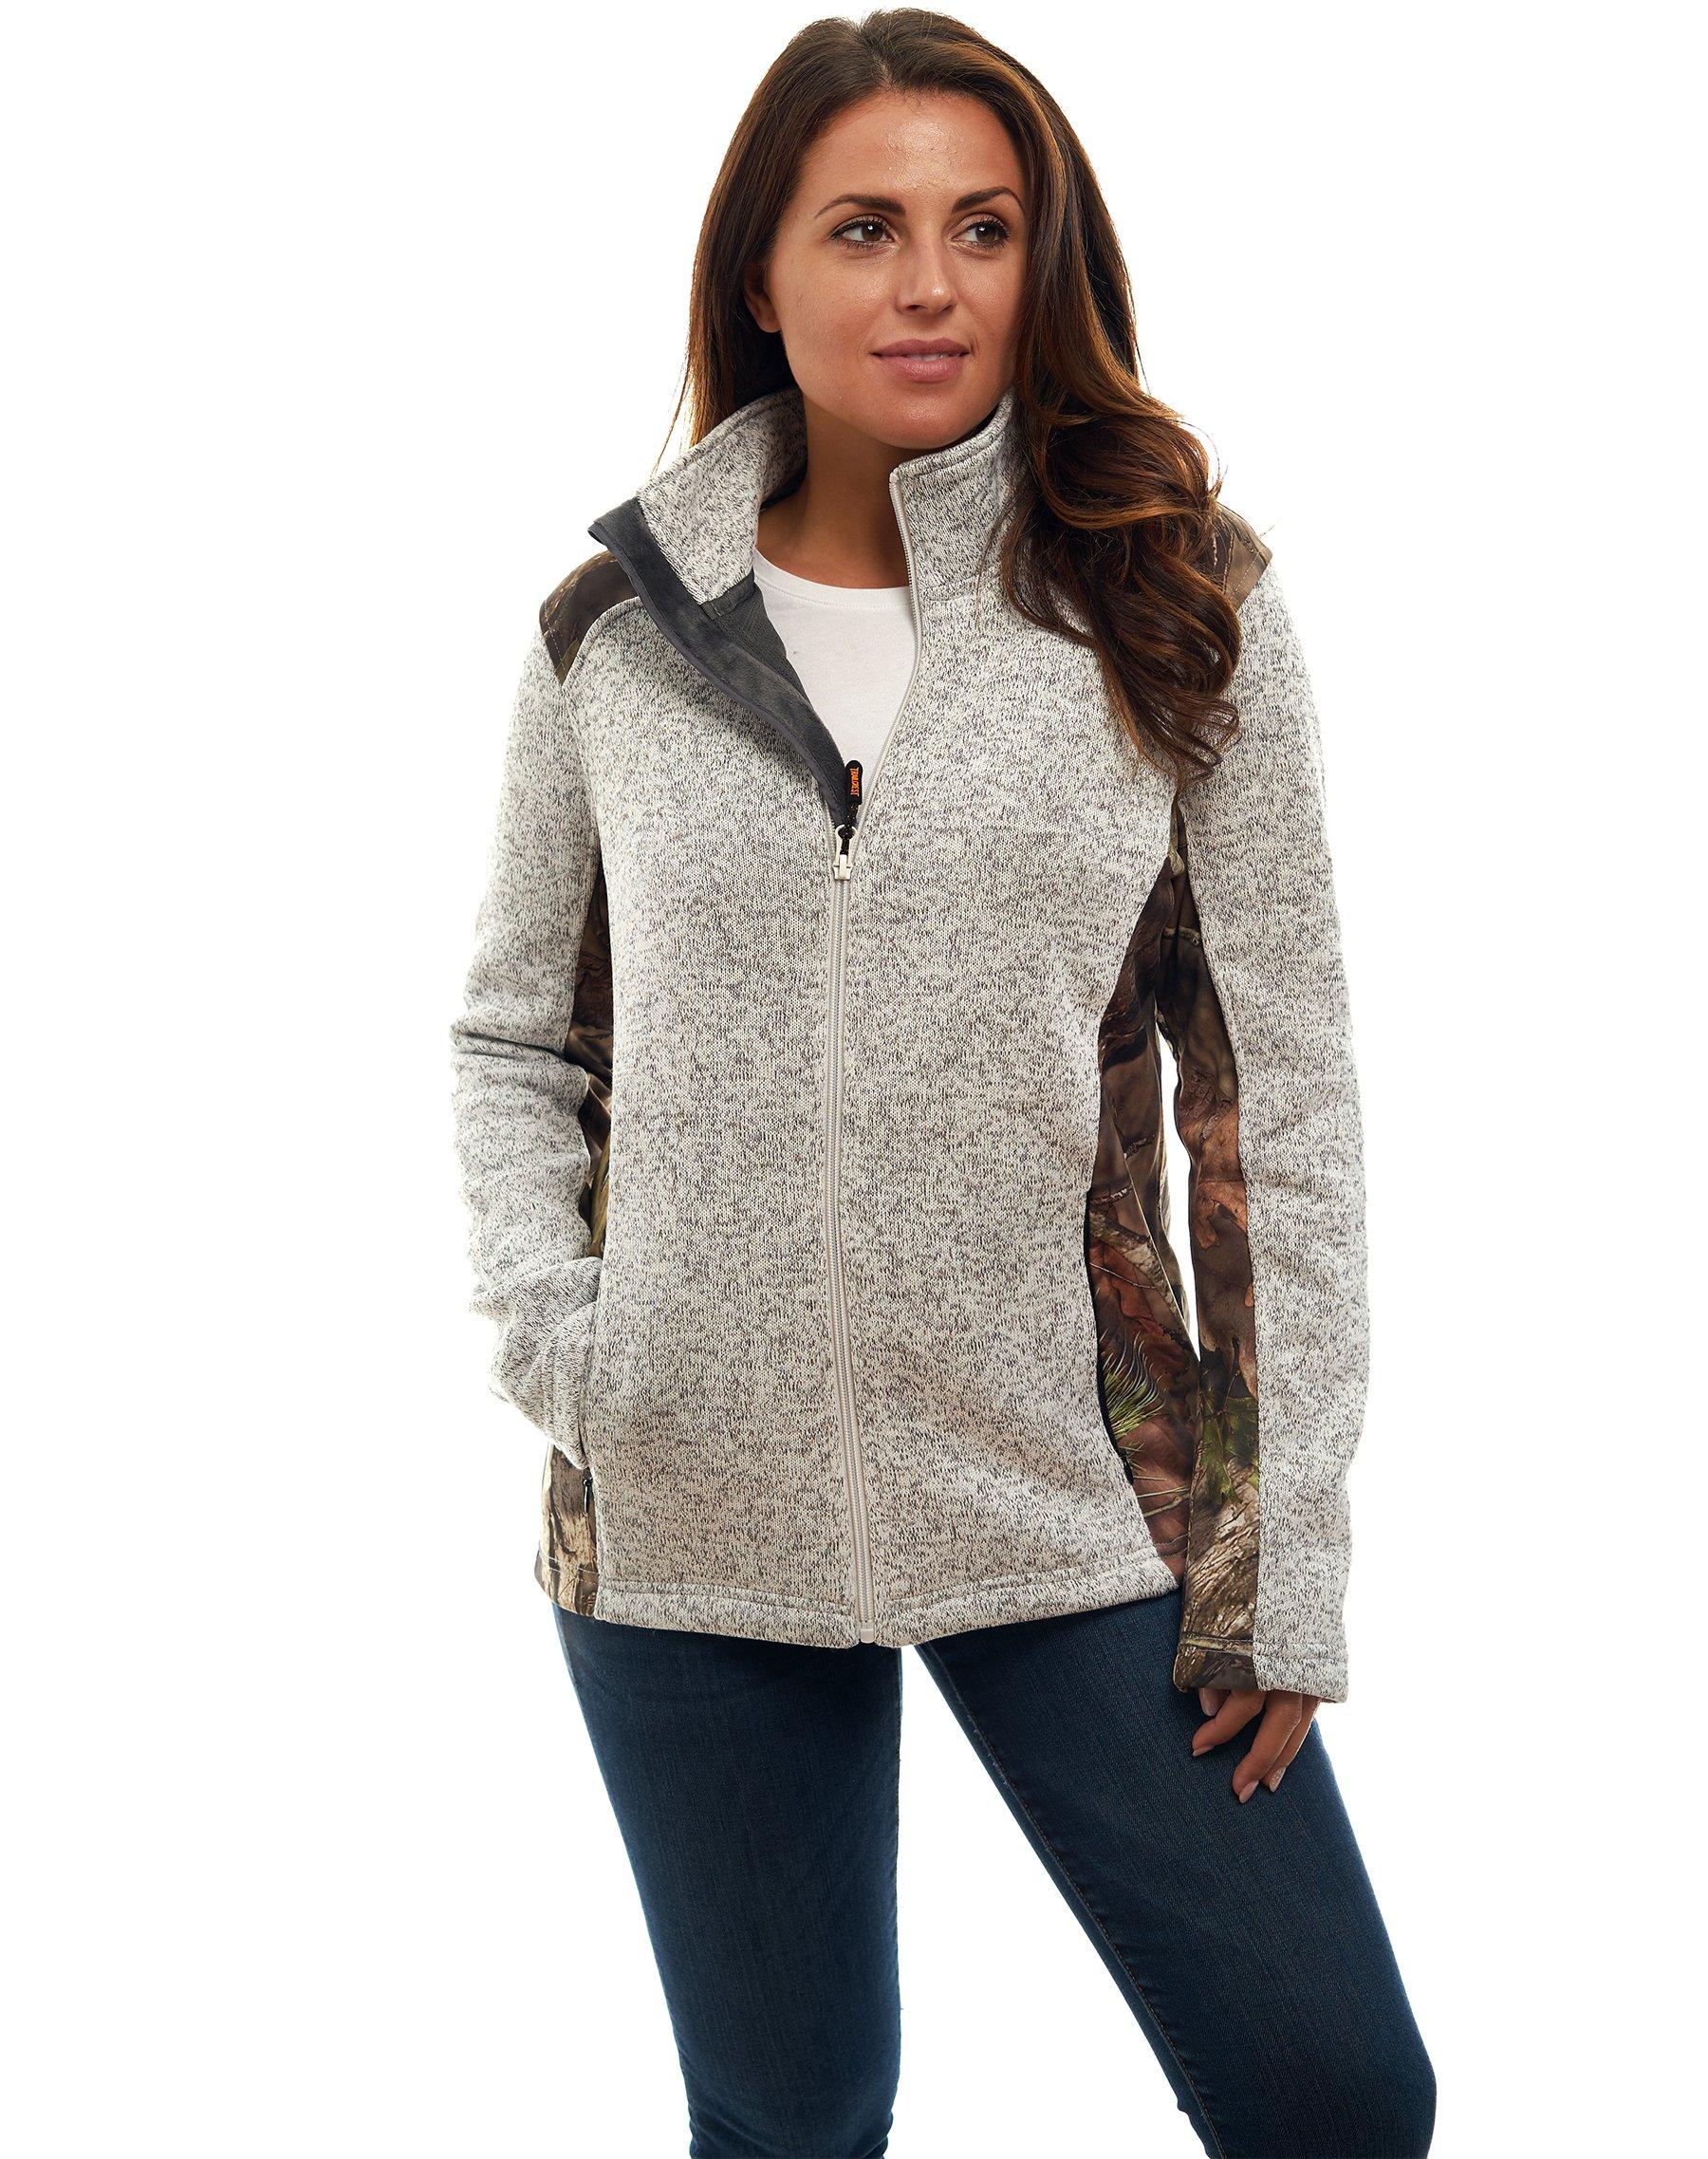 Women's Mossy Oak Signature Sweater Fleece Full Zip Jacket